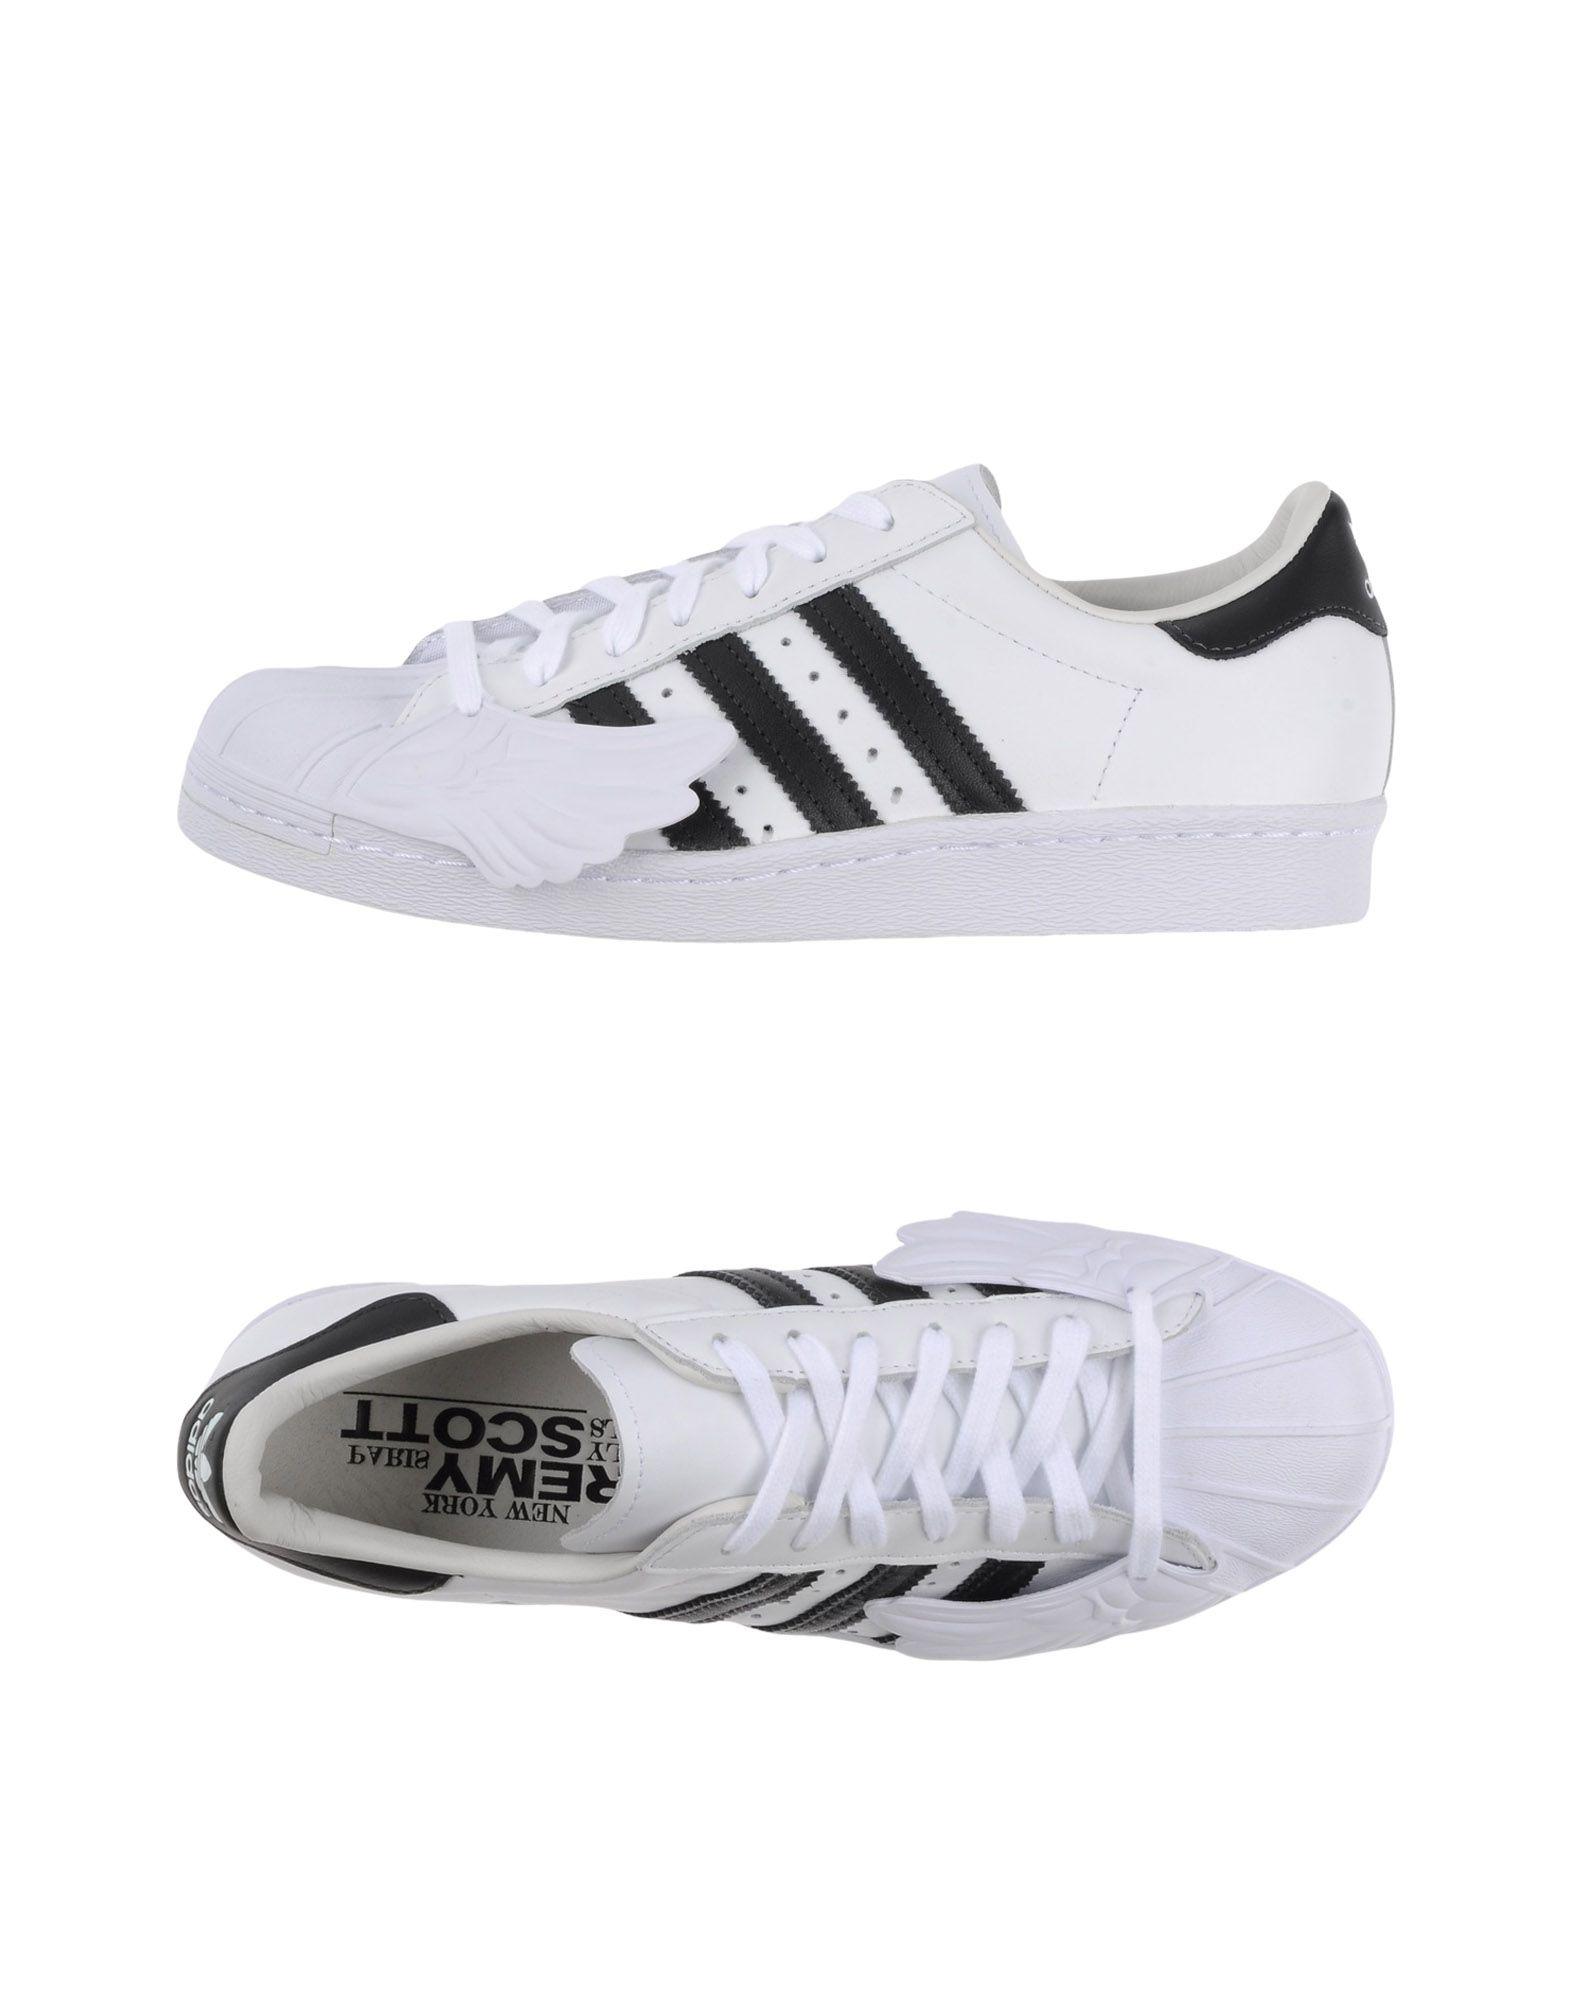 ADIDAS ORIGINALS by JEREMY SCOTT Низкие кеды и кроссовки adidas originals by jeremy scott низкие кеды и кроссовки